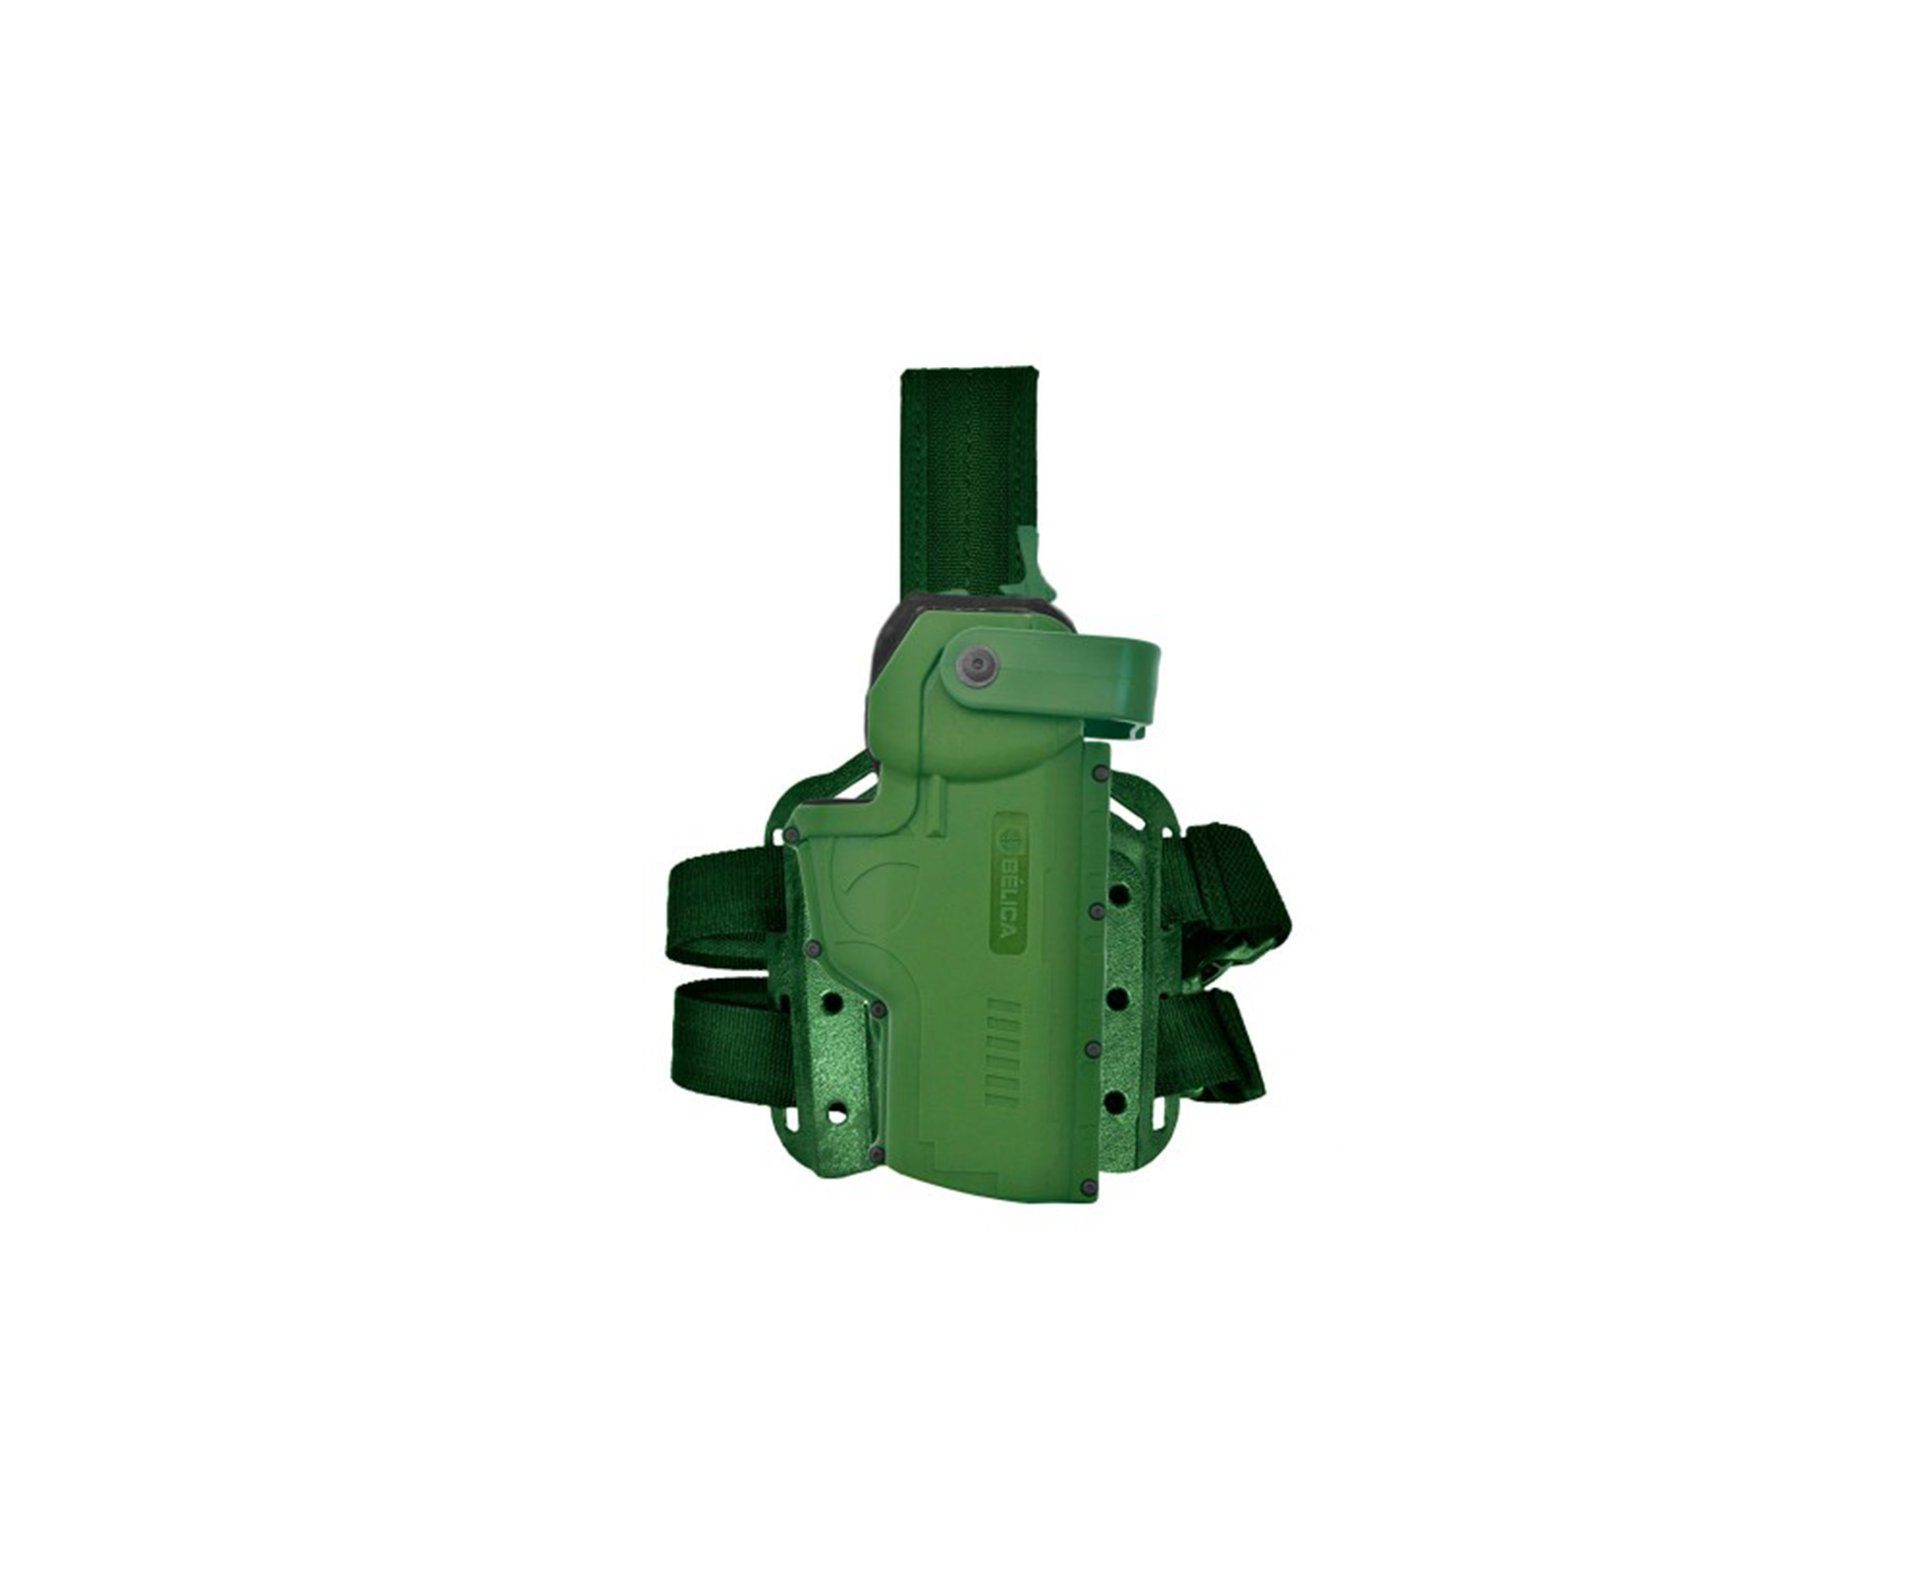 Coldre De Perna Para Pistolas Universal Verde - Belica